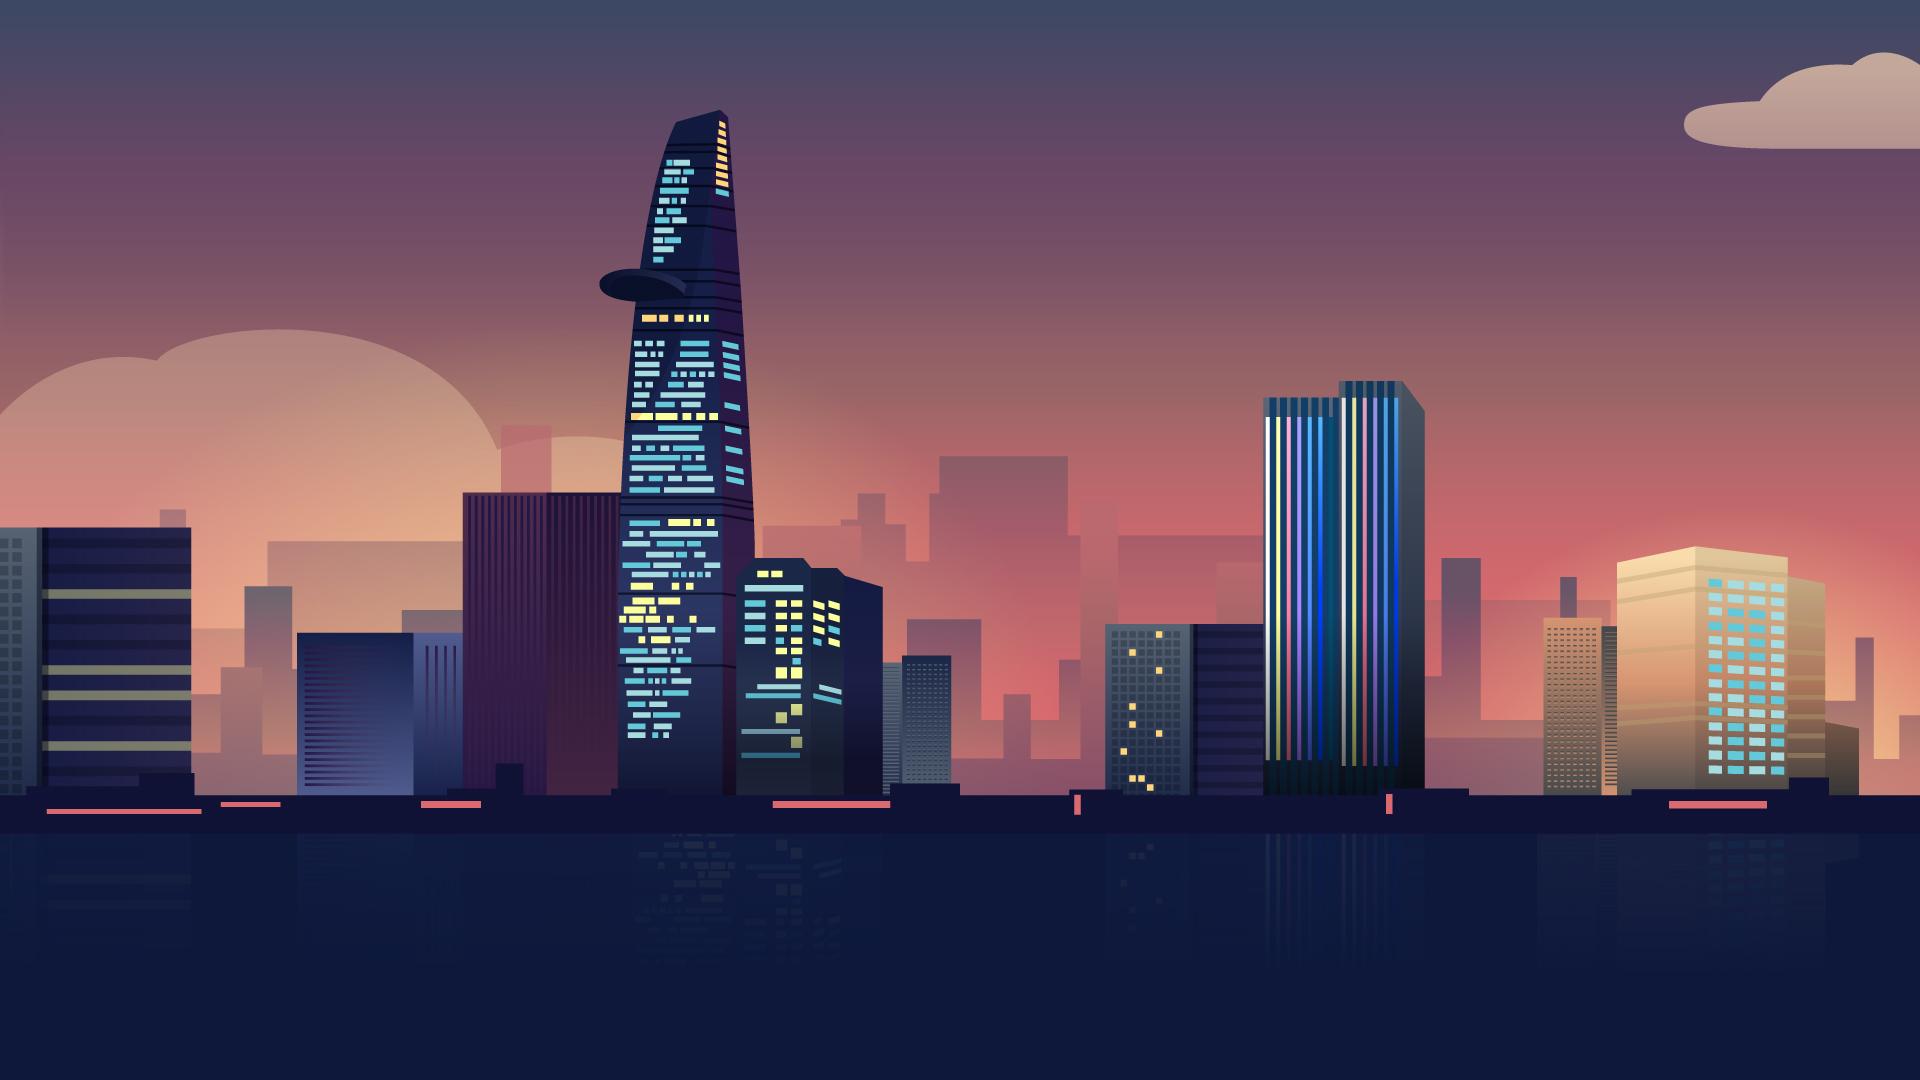 city illus-01.jpg